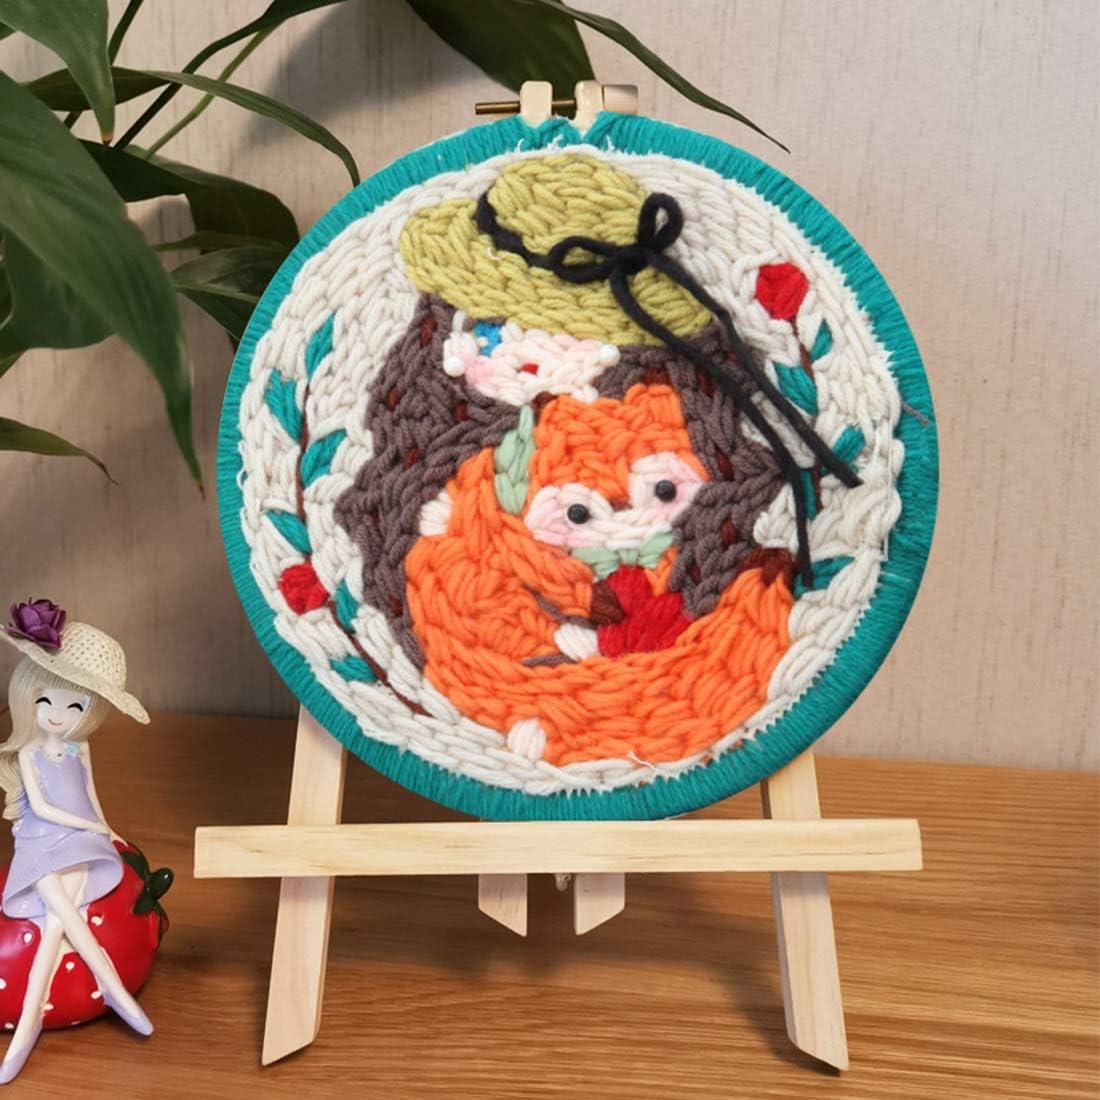 Latch Hook Craft Kits for Kids Adults Beginners Punch Needle Starter Kit with A-Frame Yamix DIY Knitting Wool Rug Hooking Kit Romantic Season